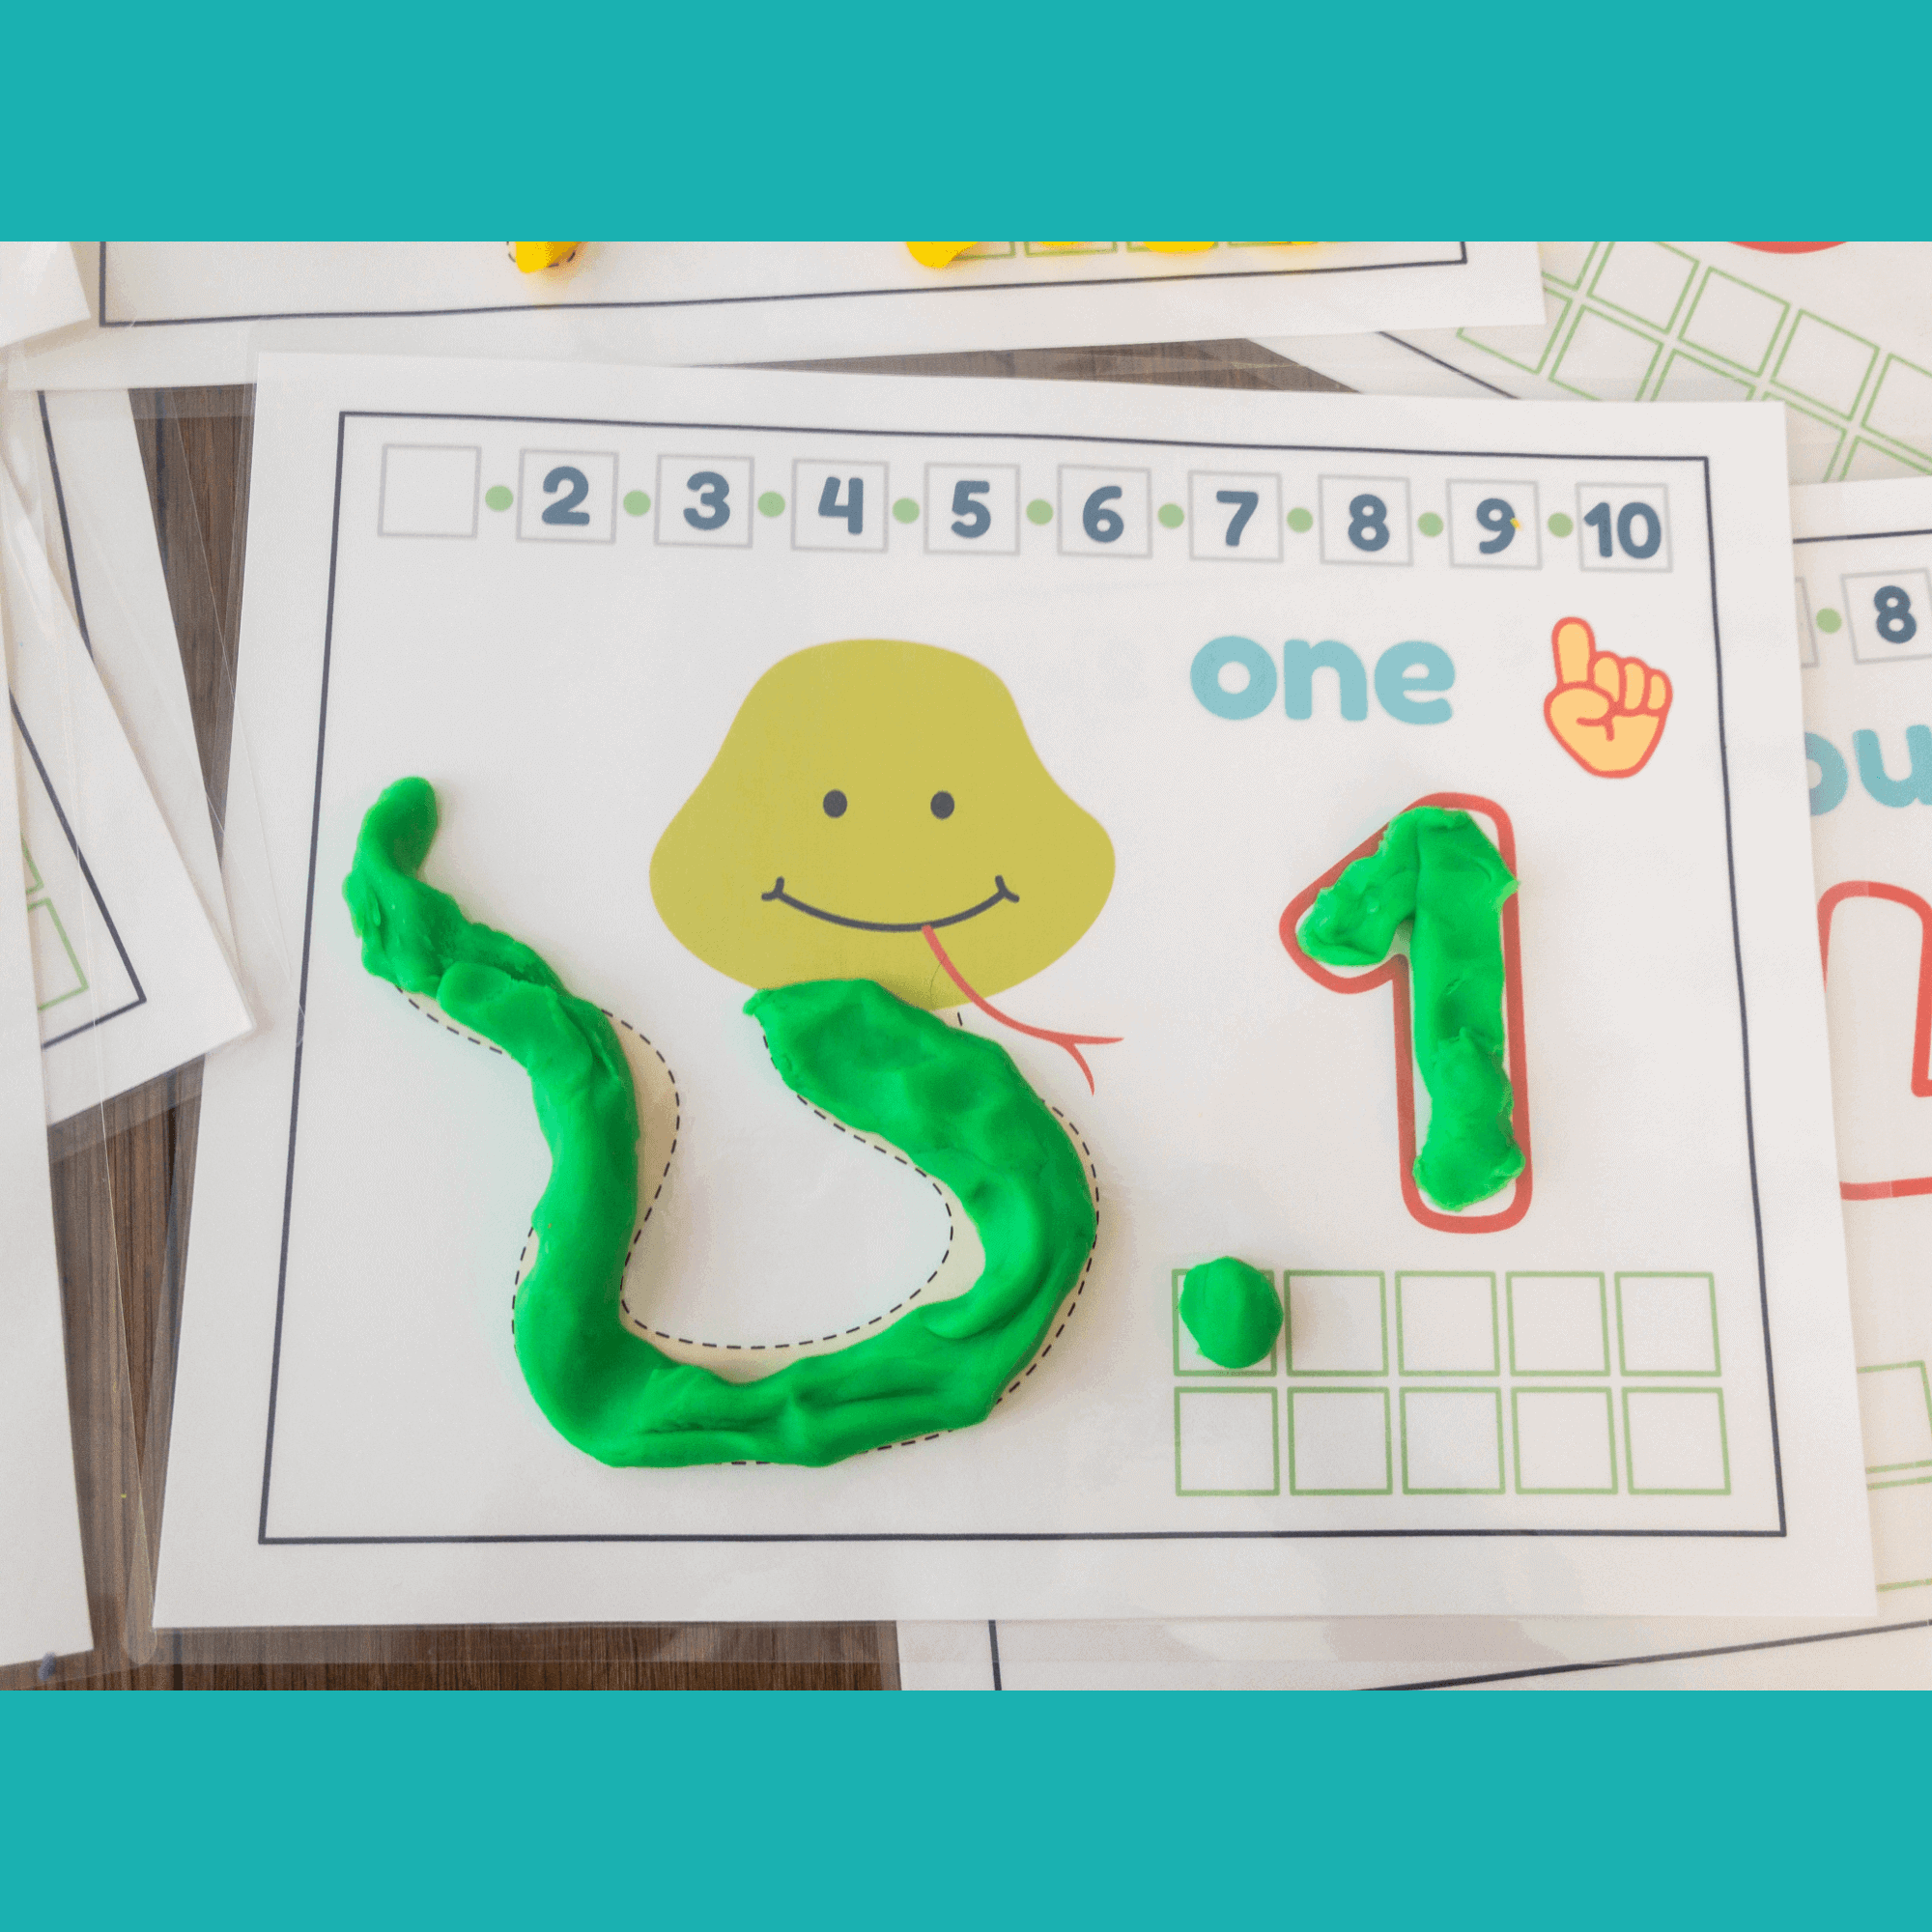 number activities and play-dough mats